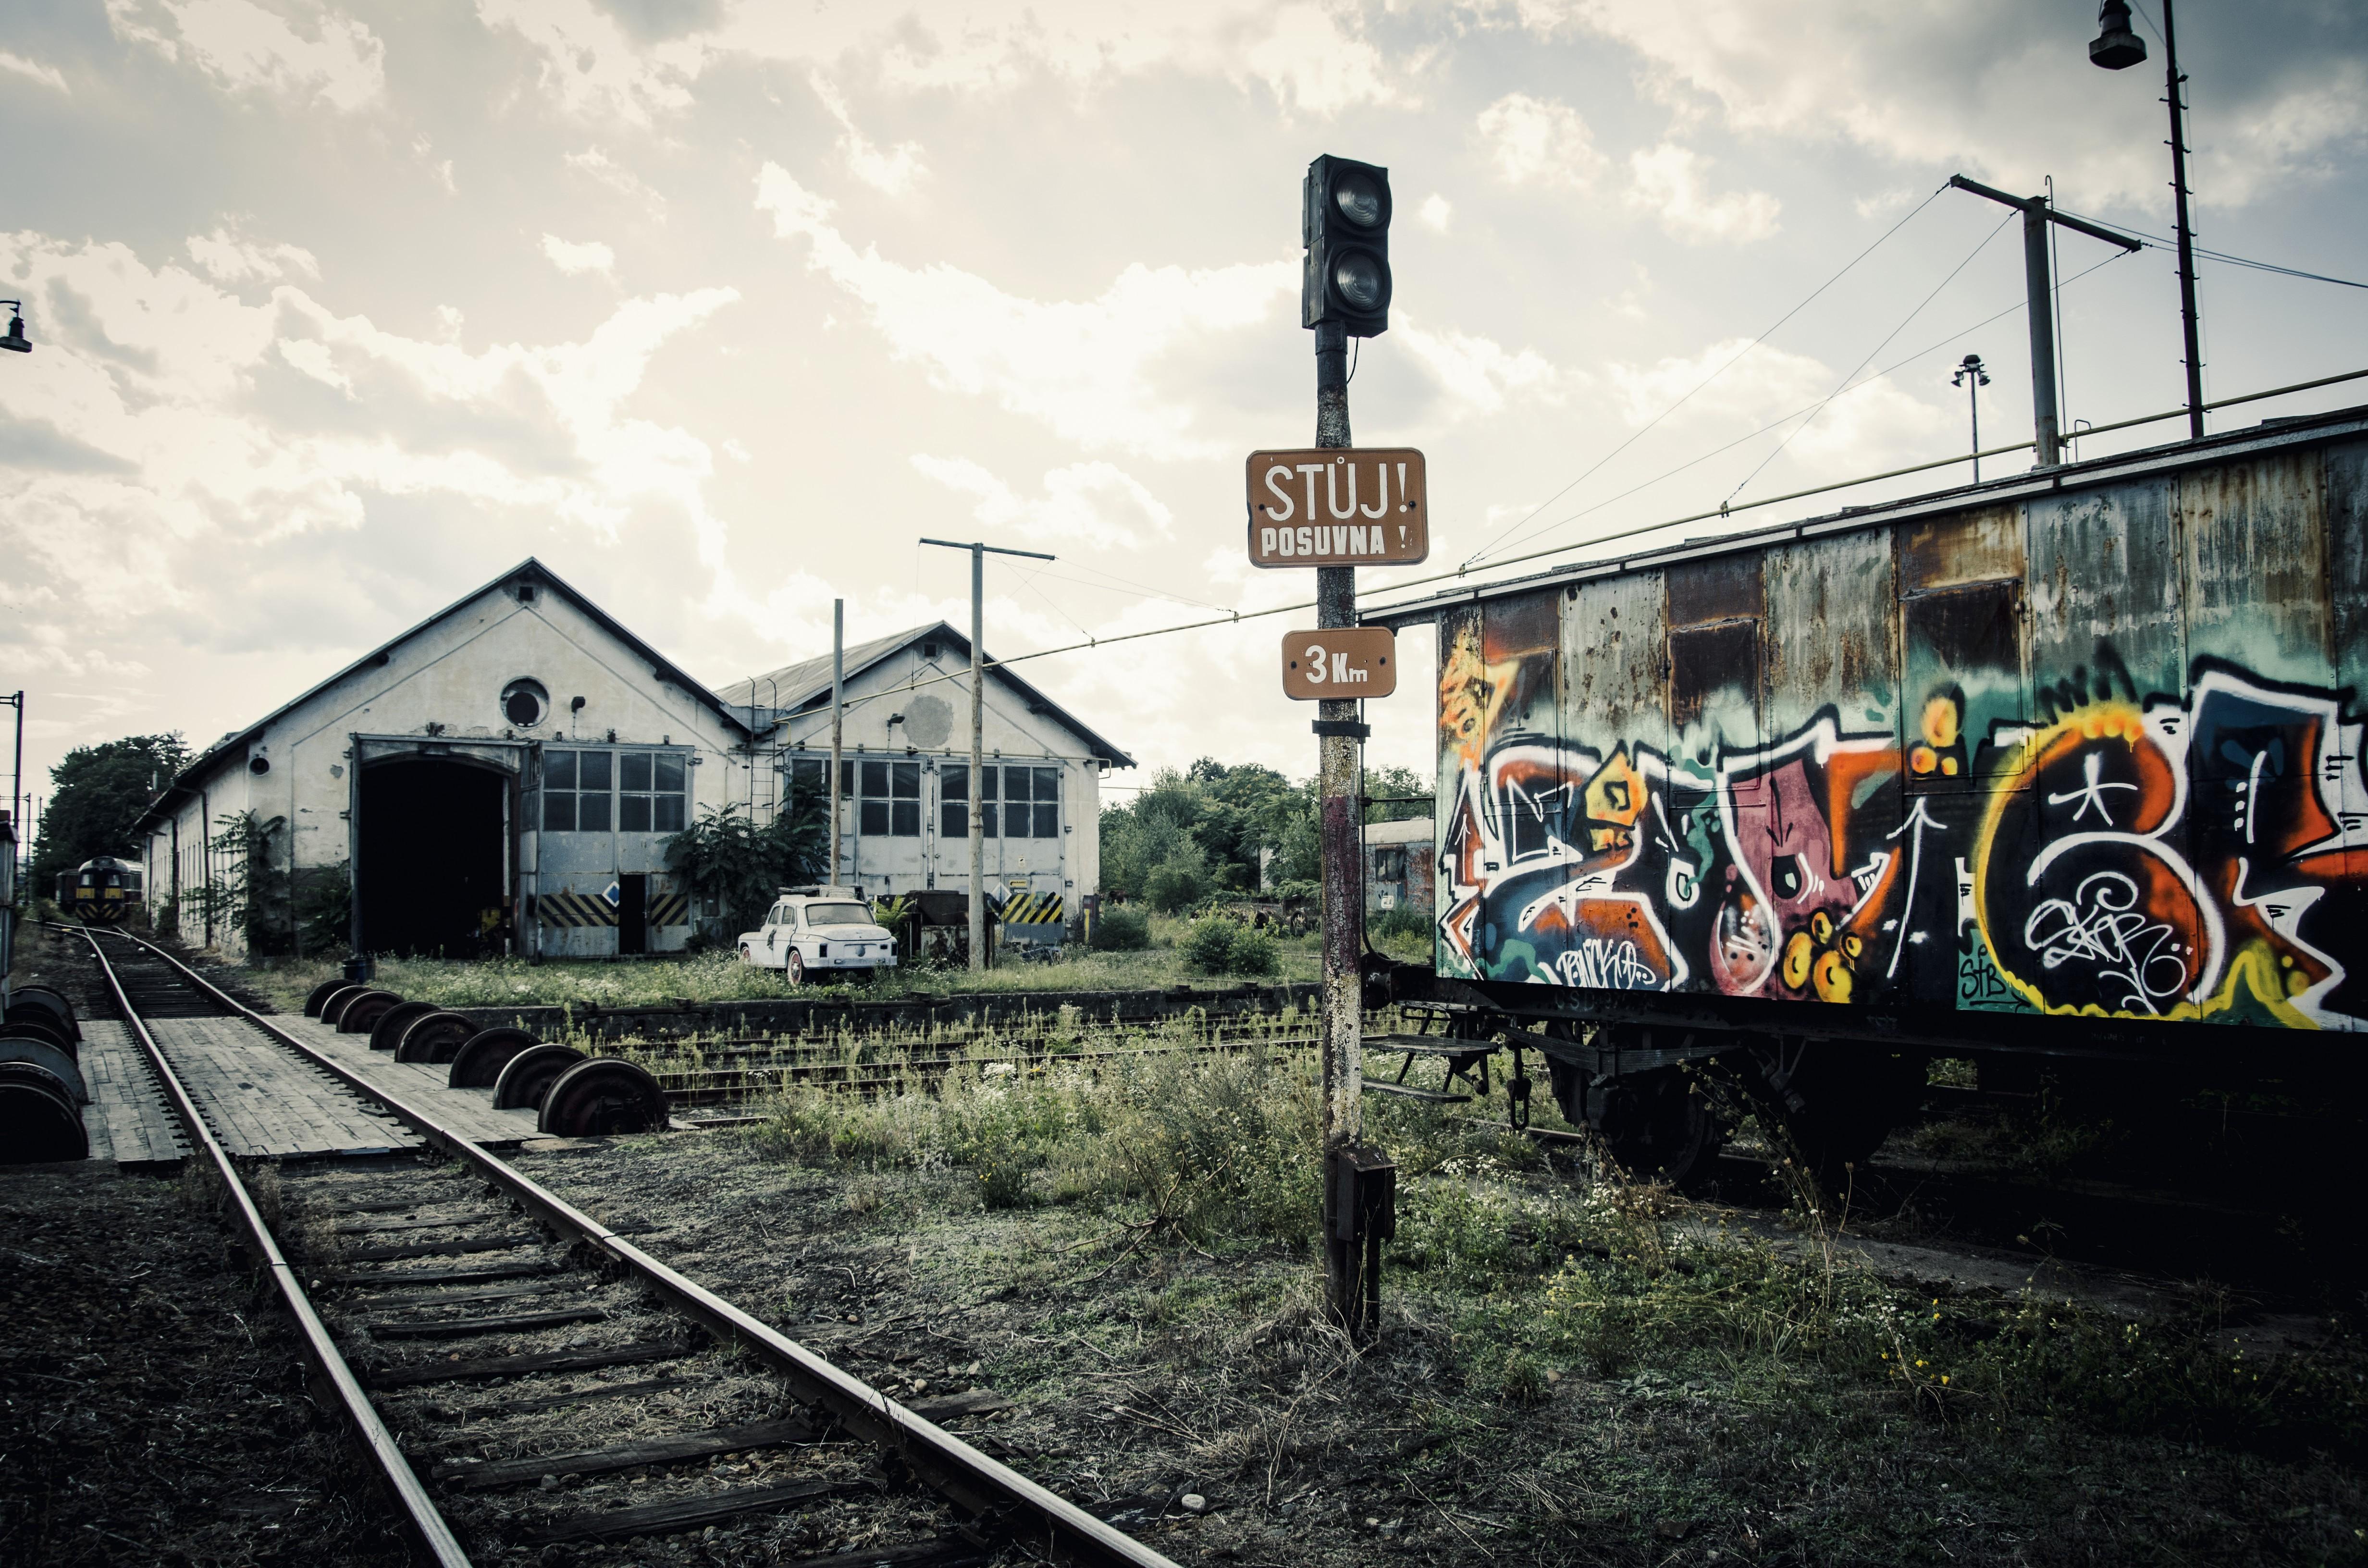 Wallpaper : nature, abandoned, sky, vehicle, clouds, train, railway, rust, old car, graffiti, rail yard, locomotive, ground, Czech Republic, muted, ART, ...